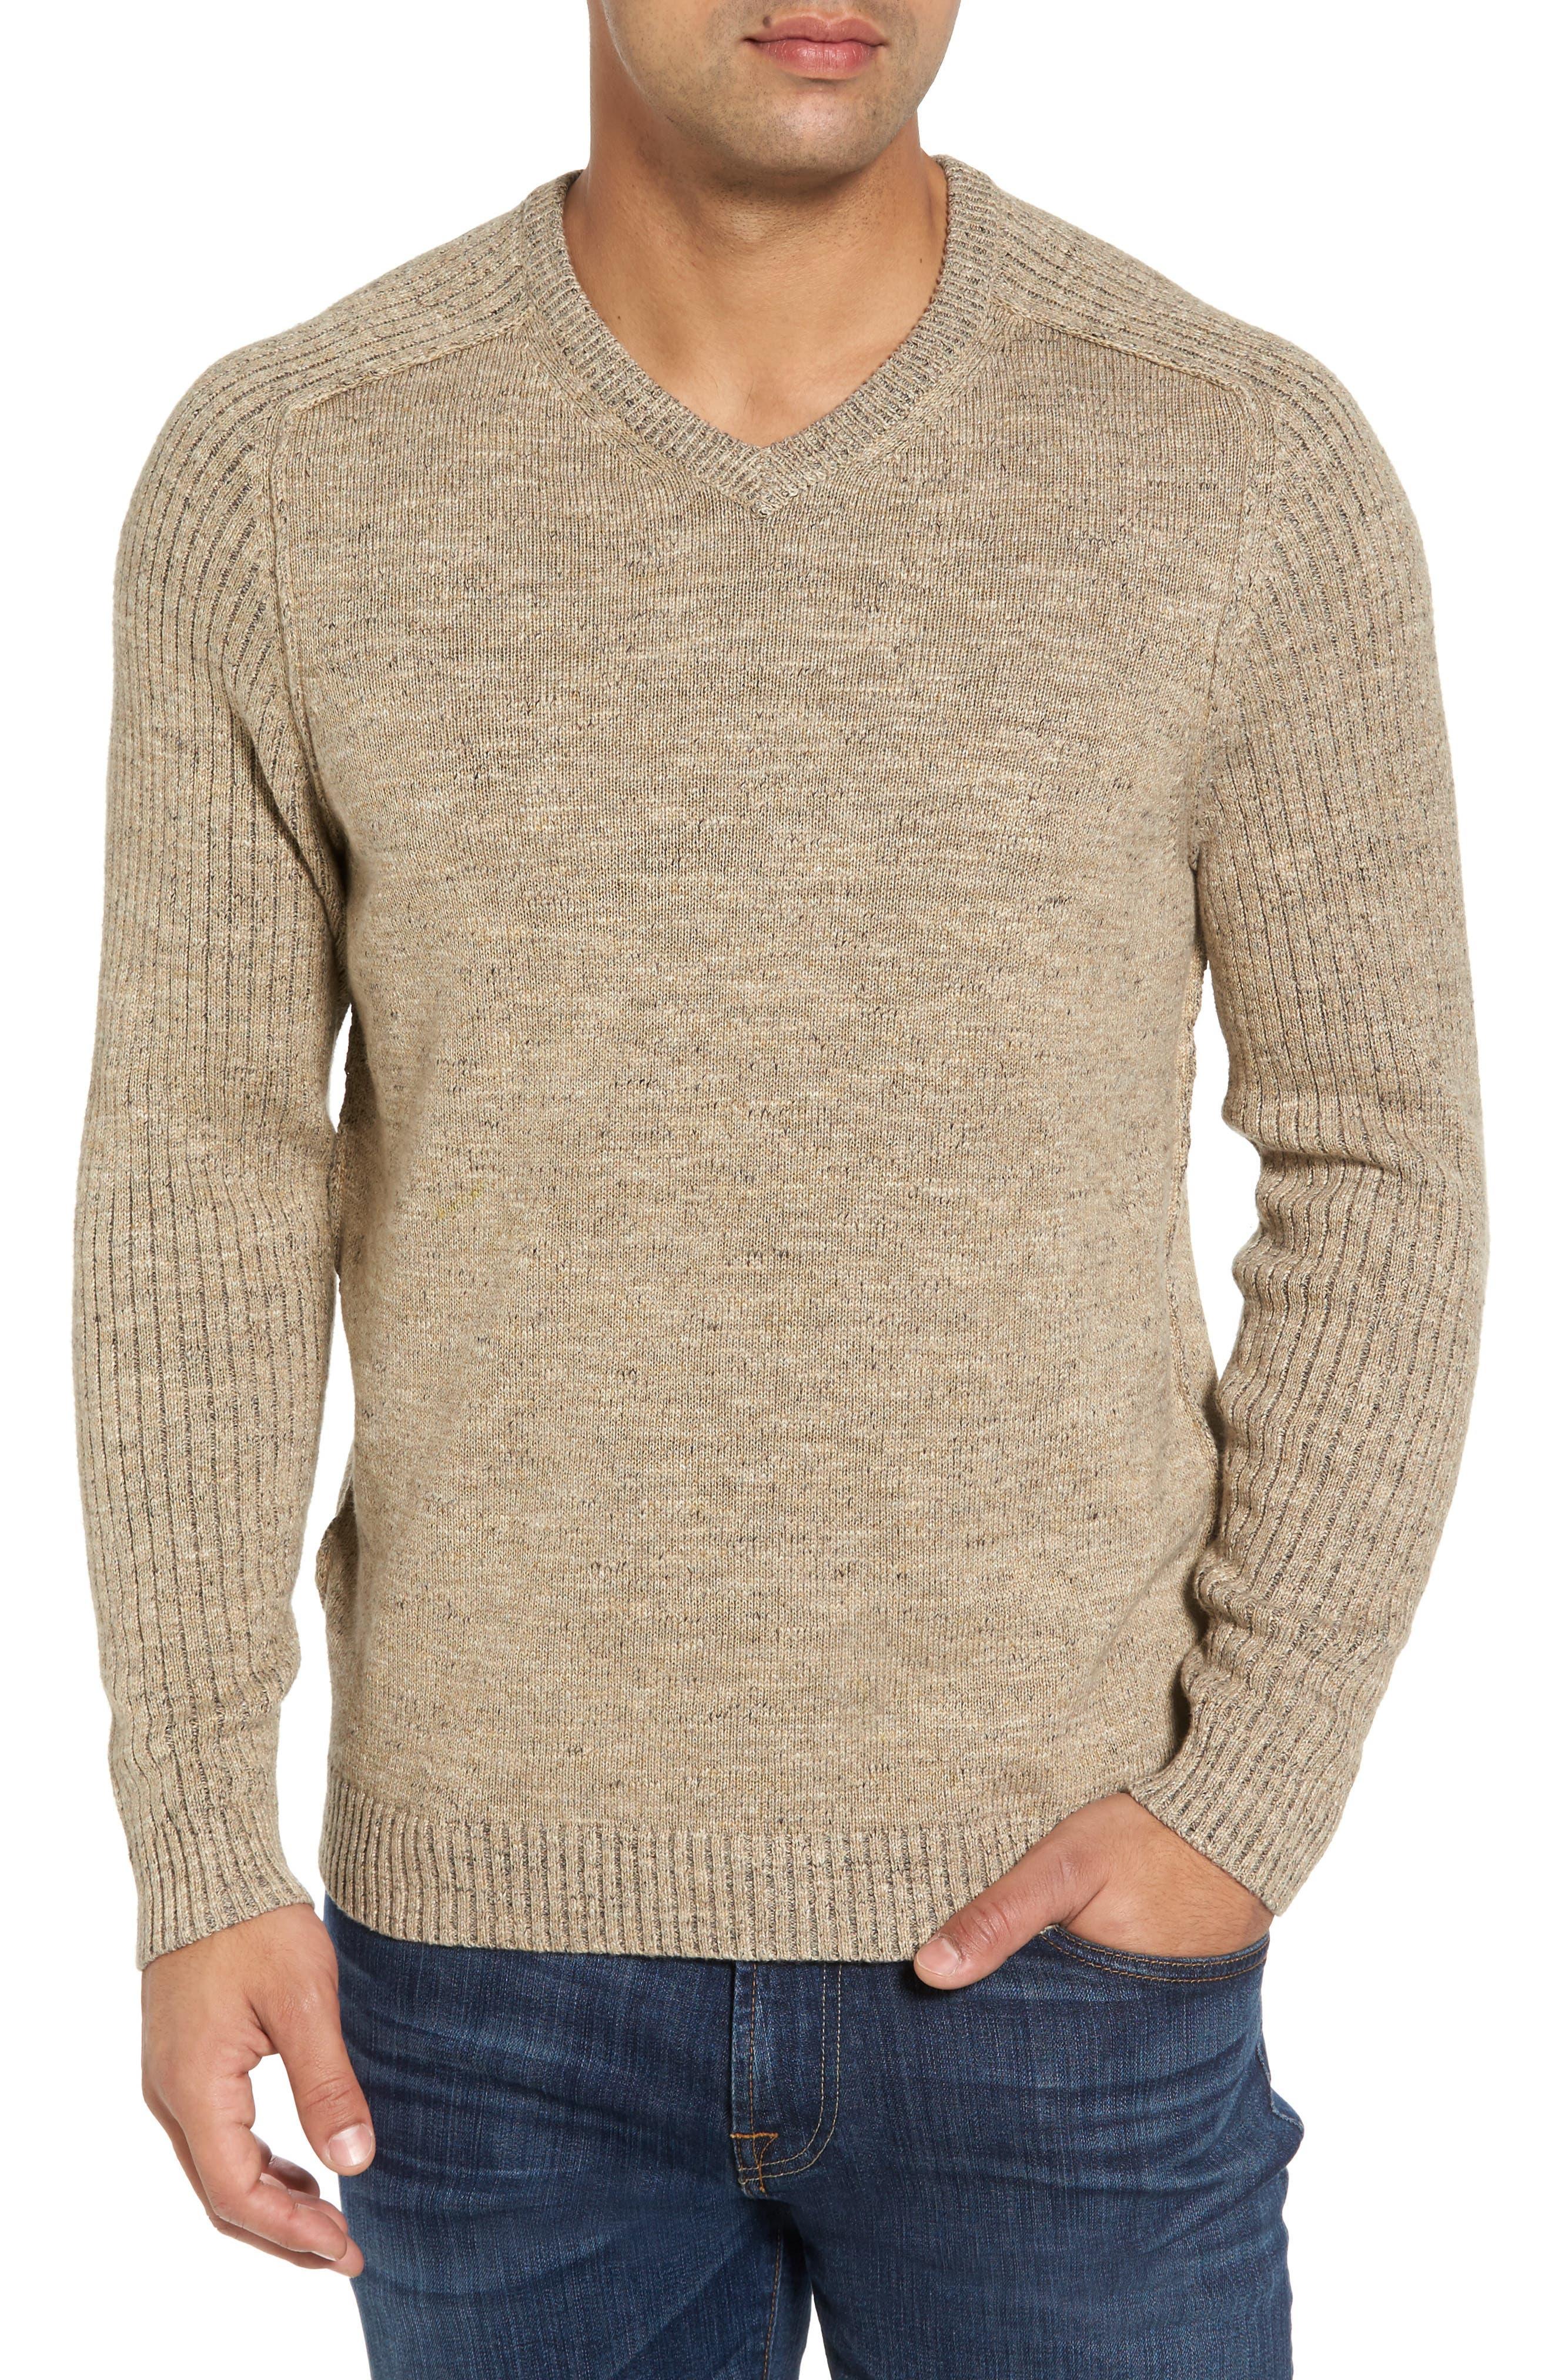 Alternate Image 1 Selected - Tommy Bahama Gran Rey Flip Reversible Cotton & Wool Sweater